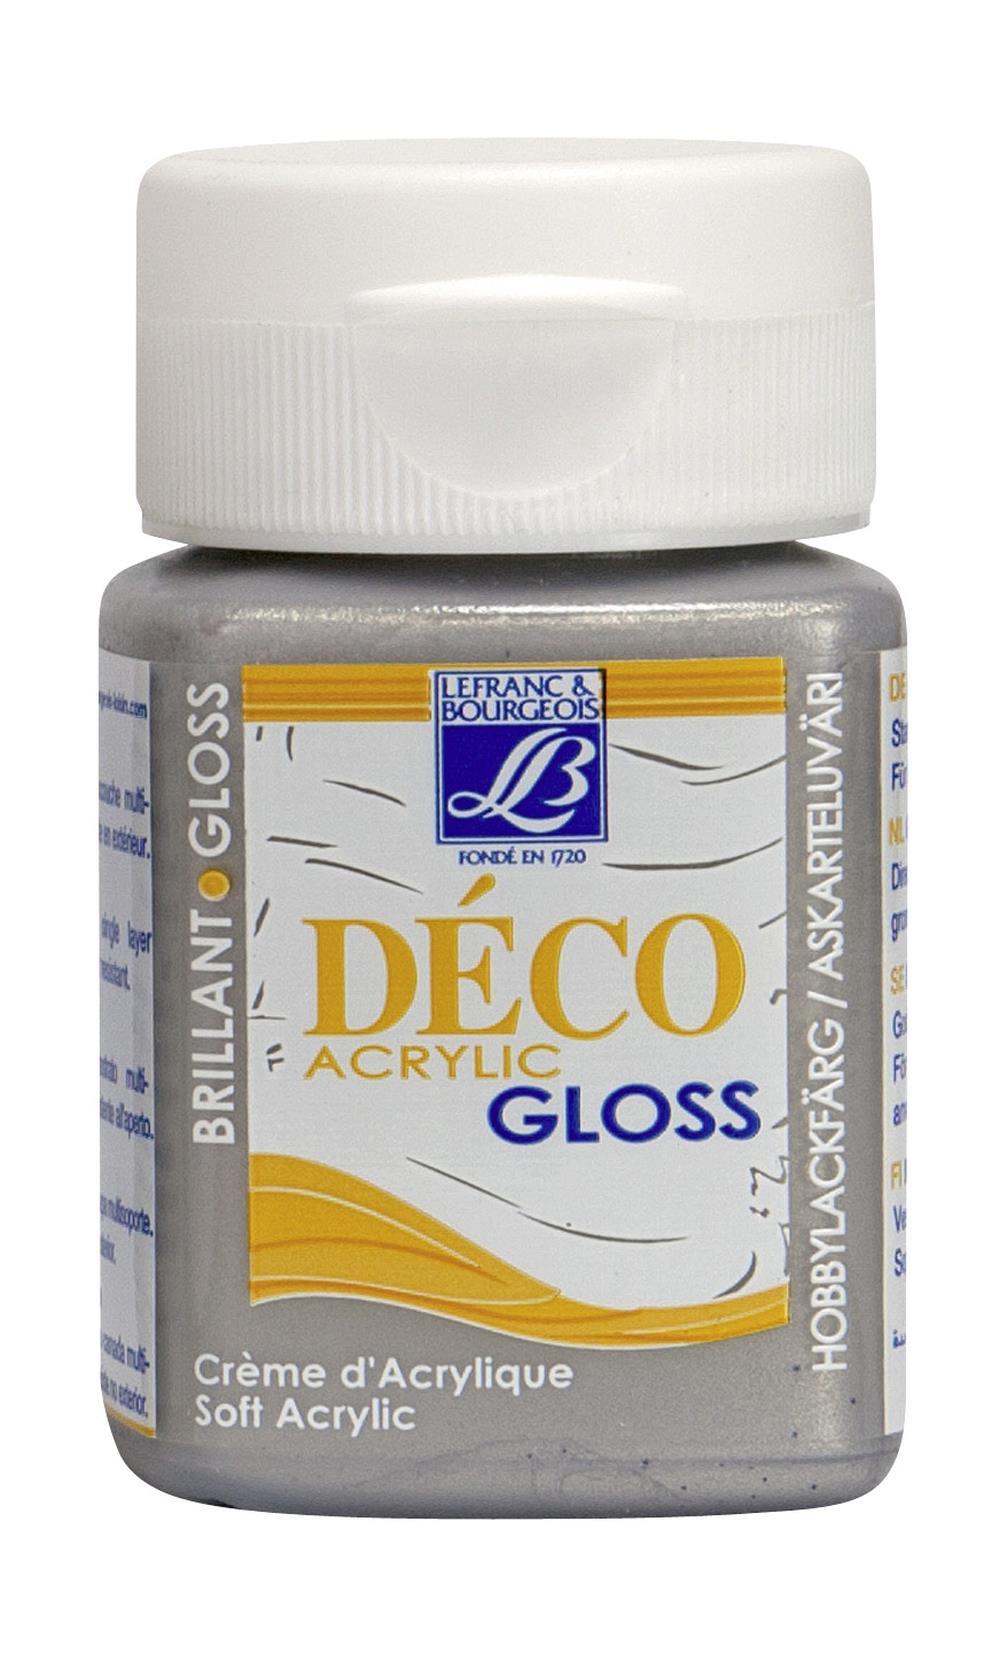 Hobbyfärg L&B Deco Gloss Akryl 50ml Silver 710 (4F) Utgår